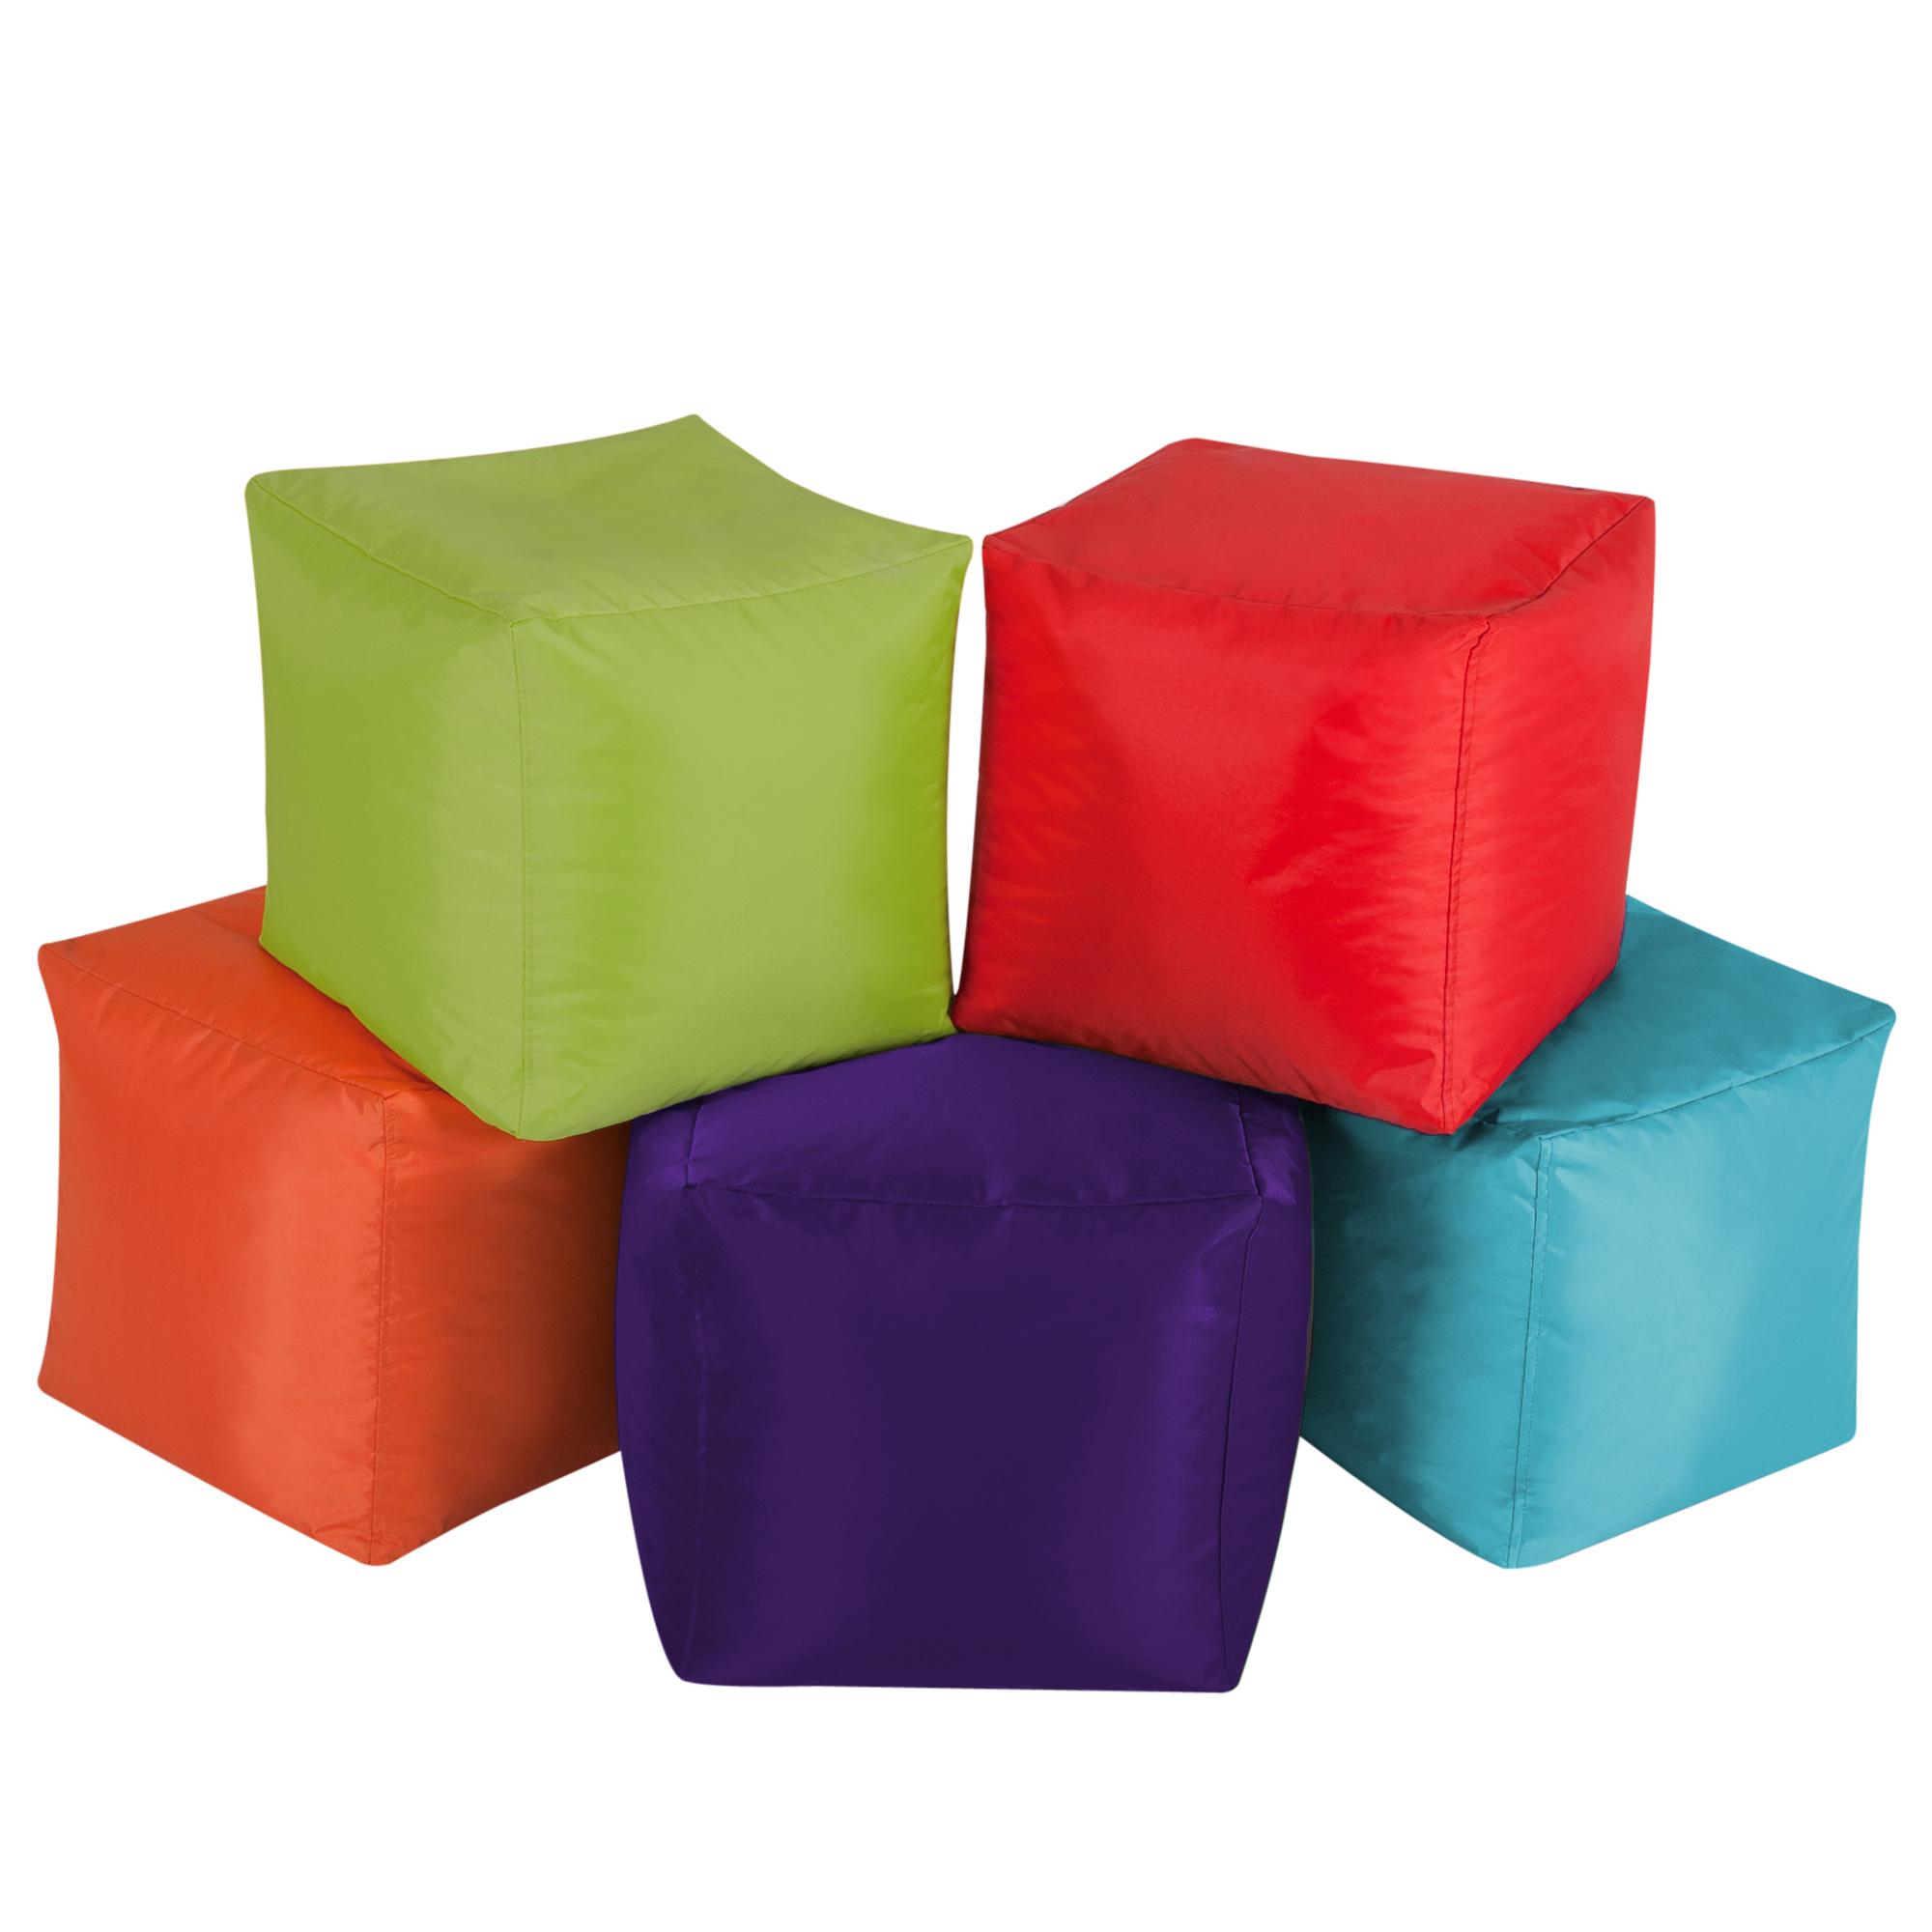 Eden-Classroom-Cube-OD-Brights-6